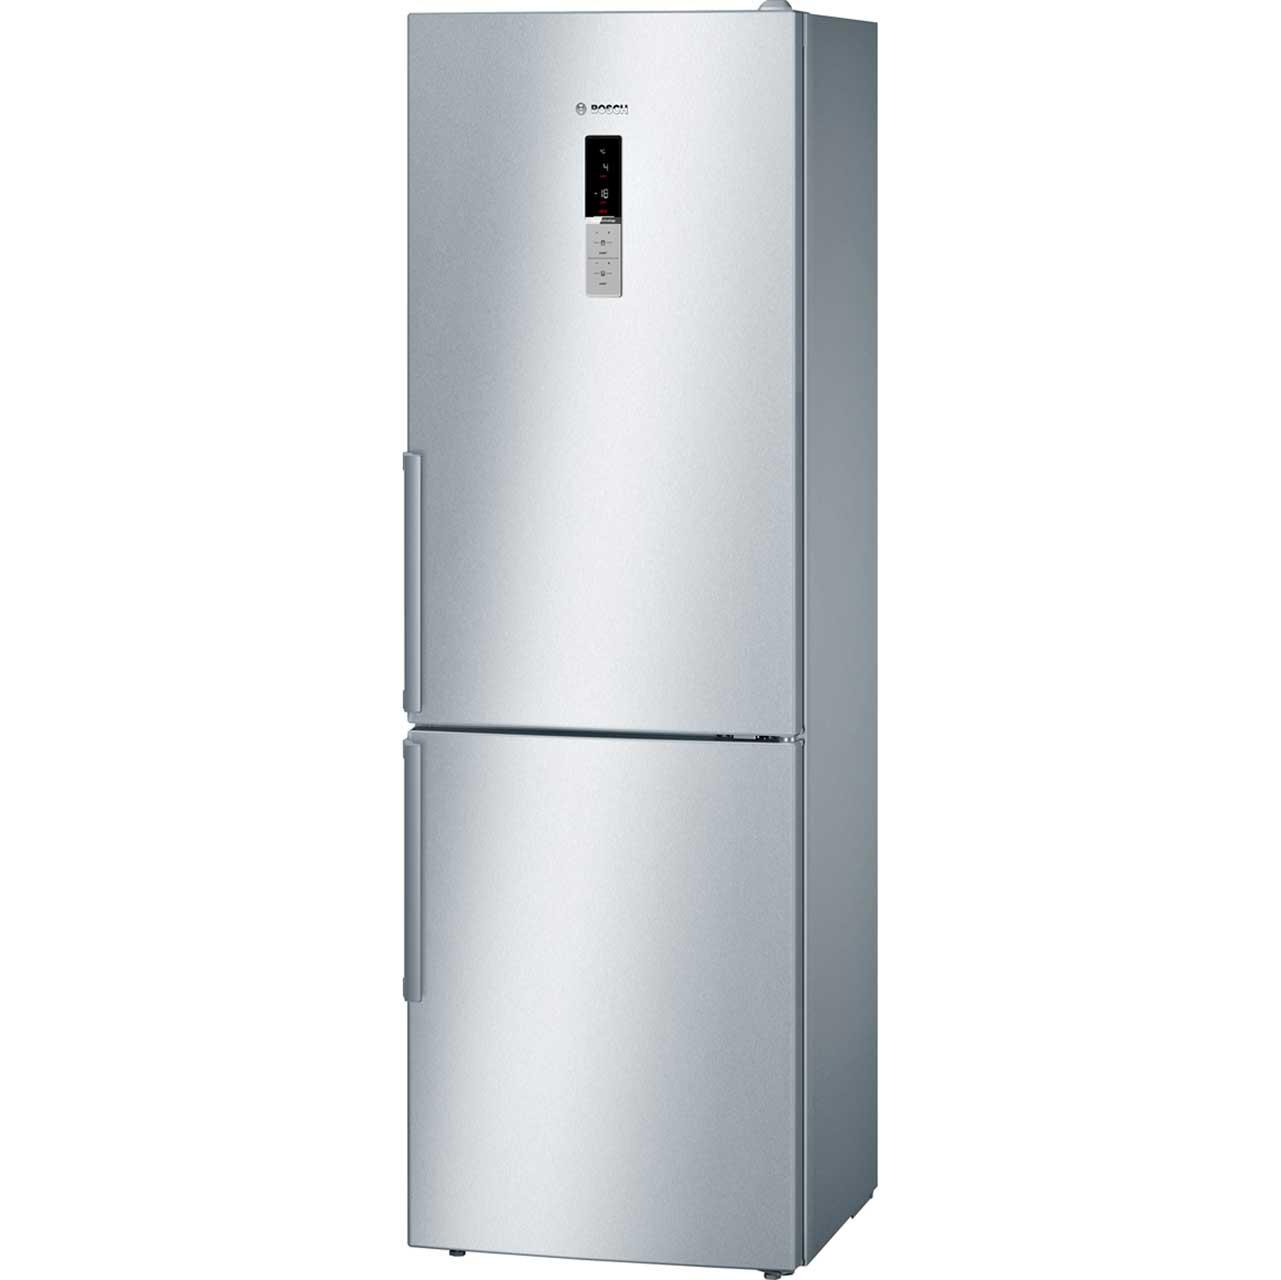 buy cheap frost free fridge freezer compare fridge. Black Bedroom Furniture Sets. Home Design Ideas